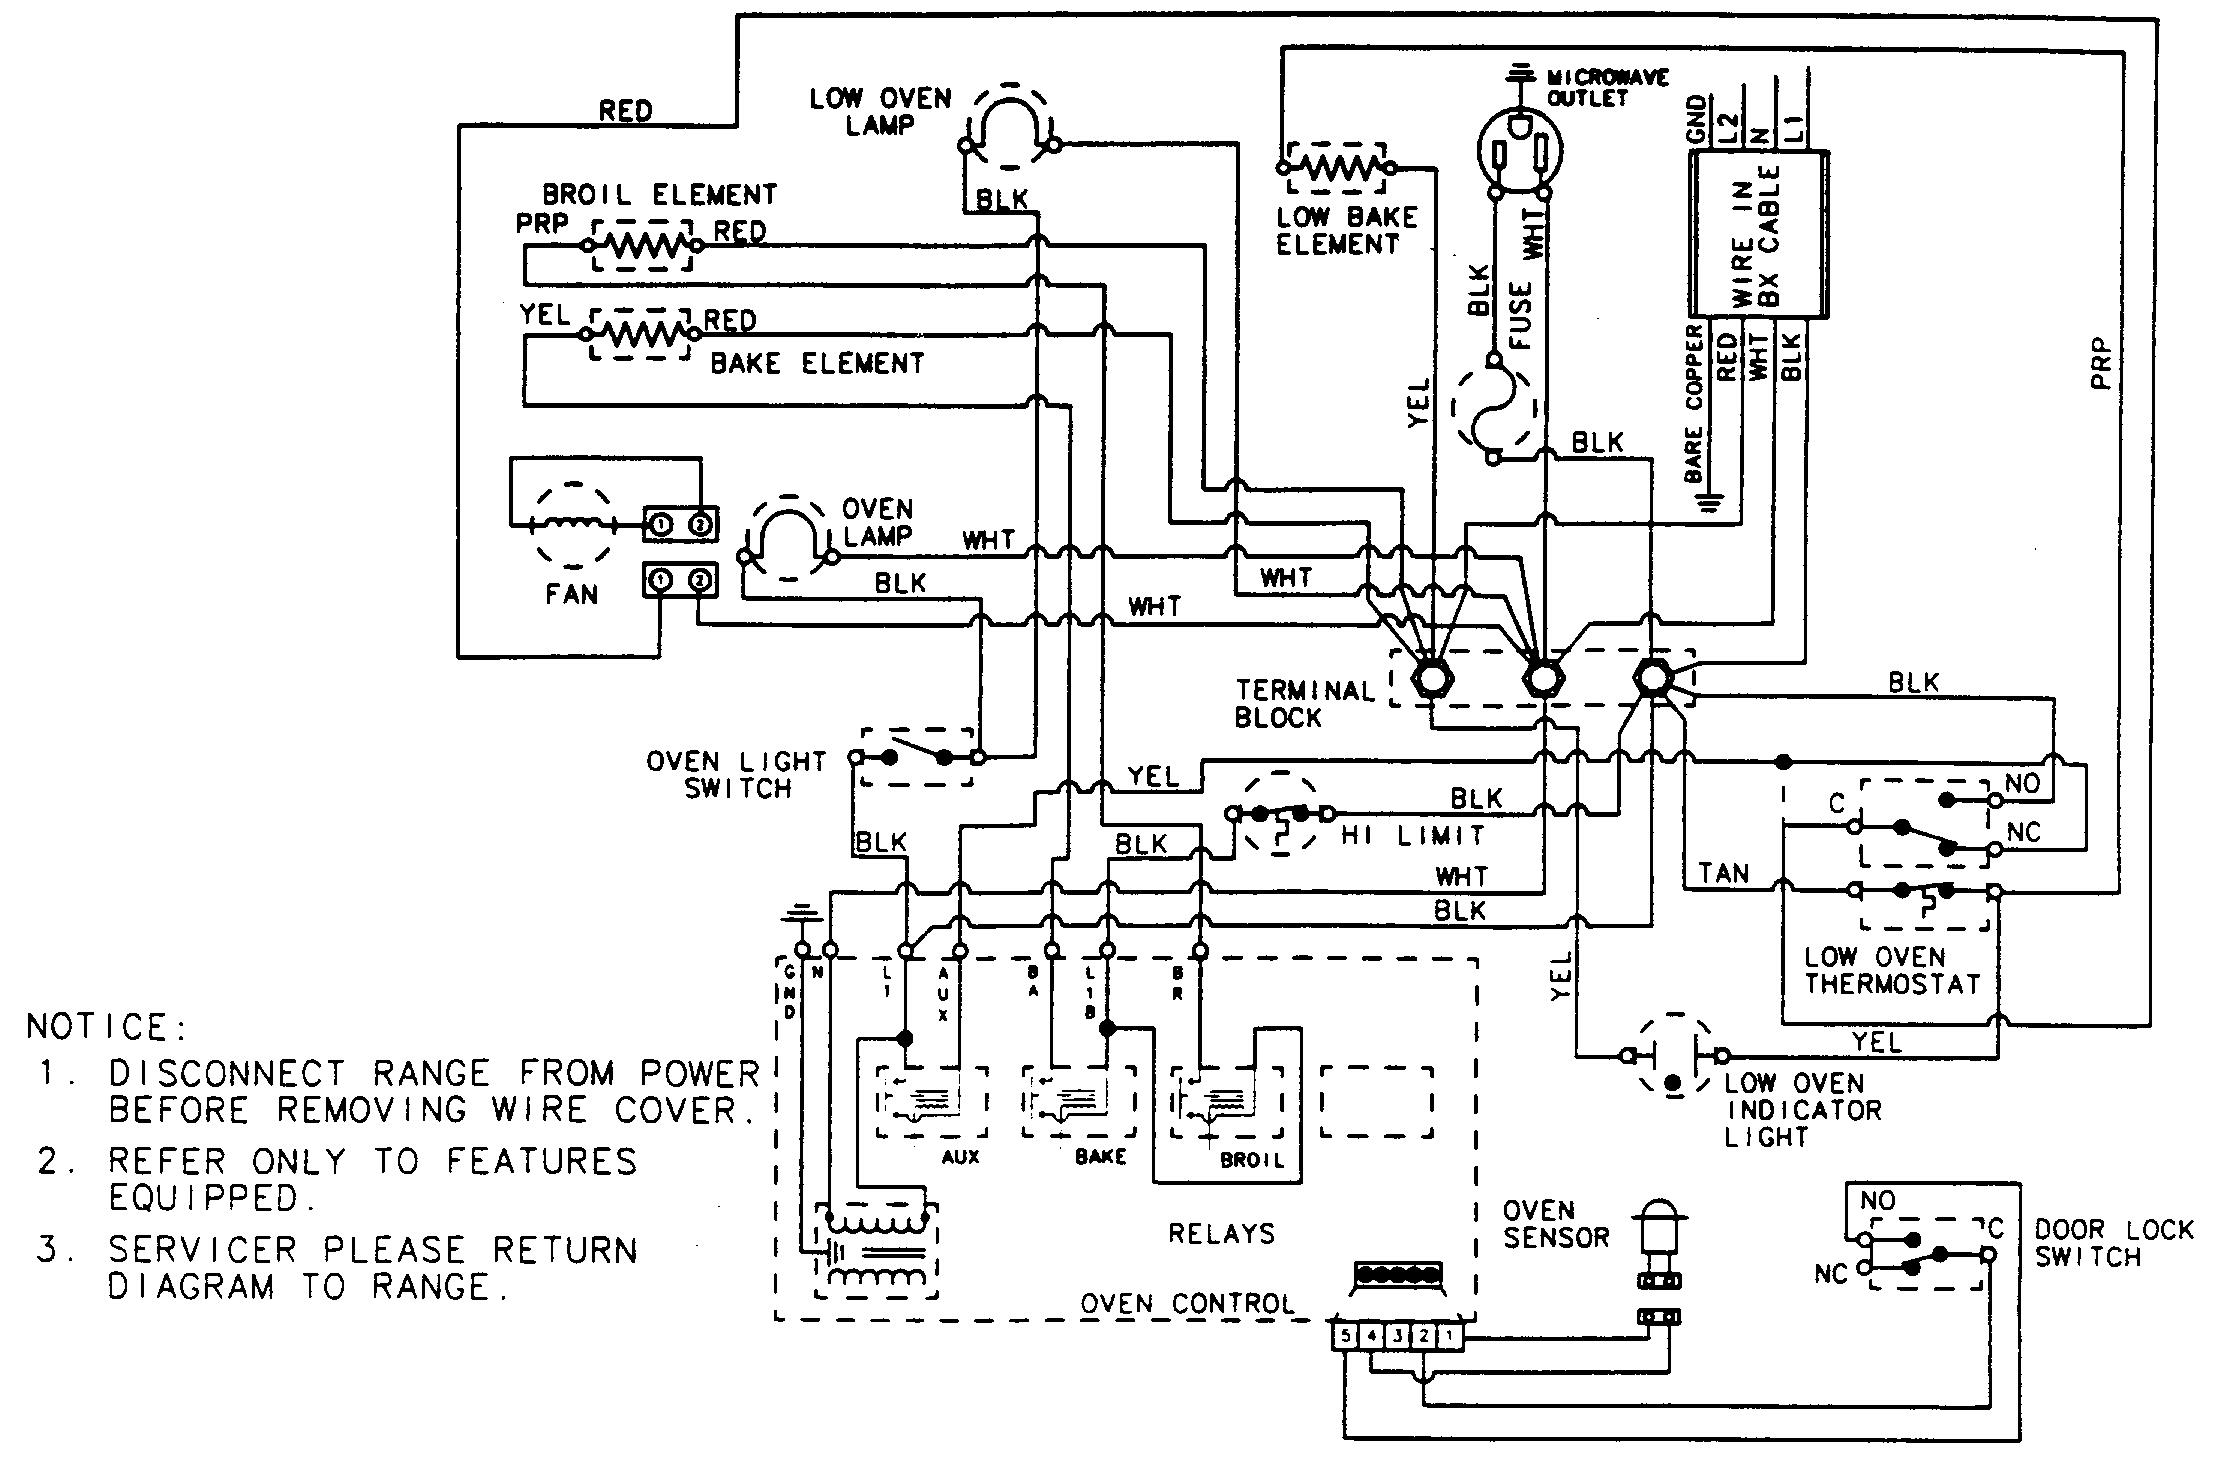 Amazing acme transformer wiring diagrams images electrical acme transformer wiring diagram 26 12 phase transformer diagrams sciox Images